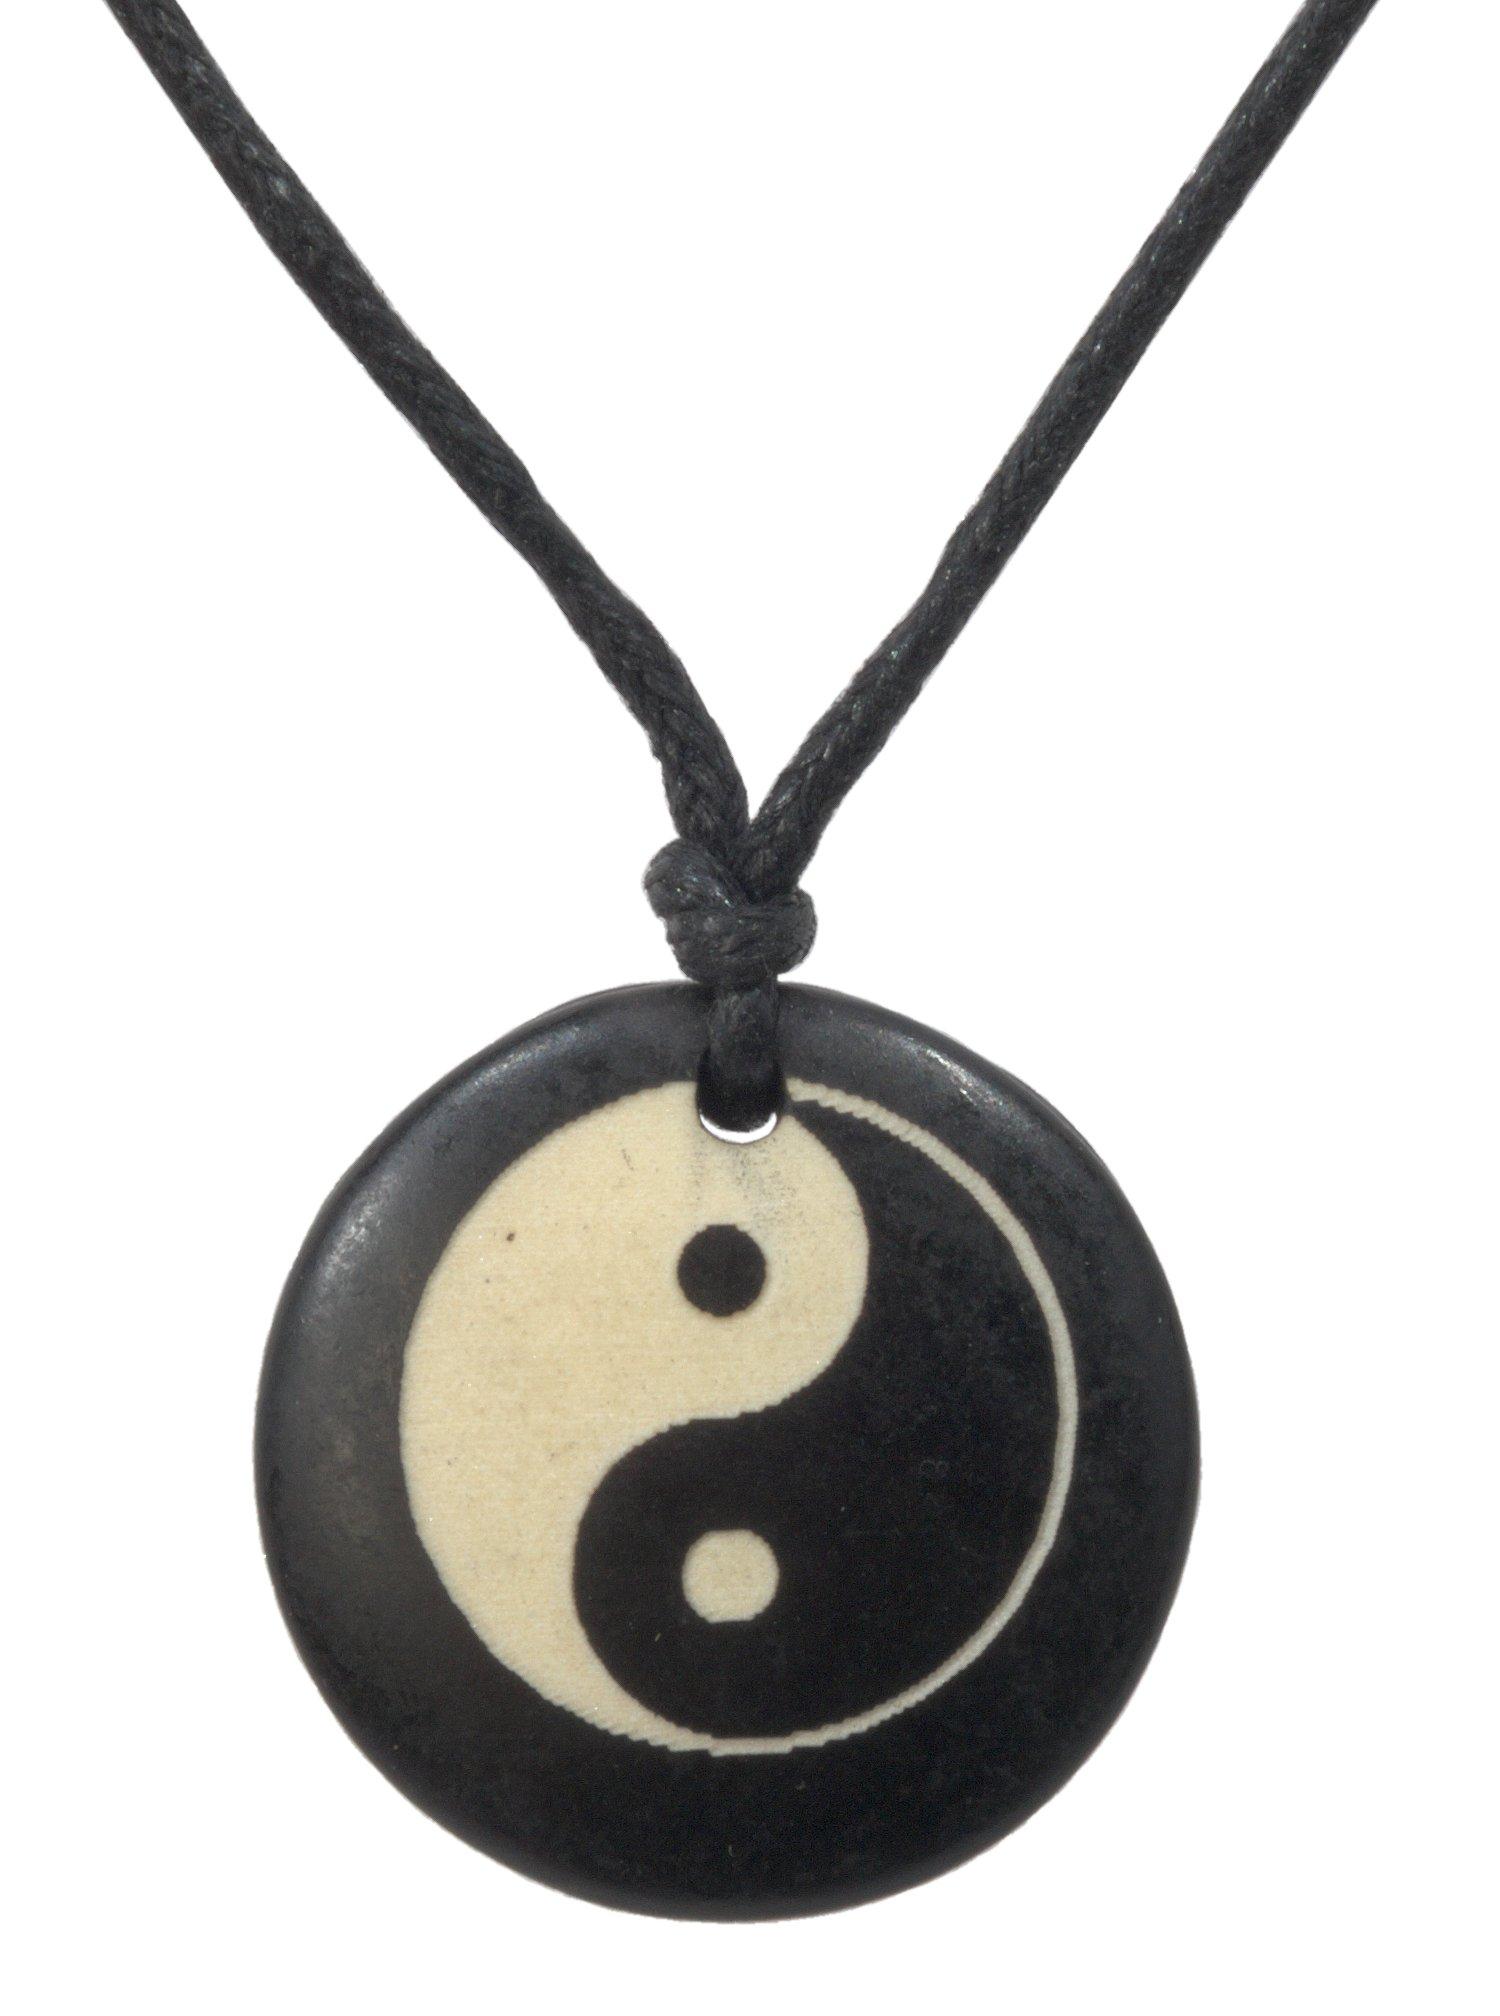 Necklace, One Handmade Unisex Necklace Carved Ying Yang Wood/Cotton (dyed) Macrame Adjustable 19'' + FREE GIFT BAG